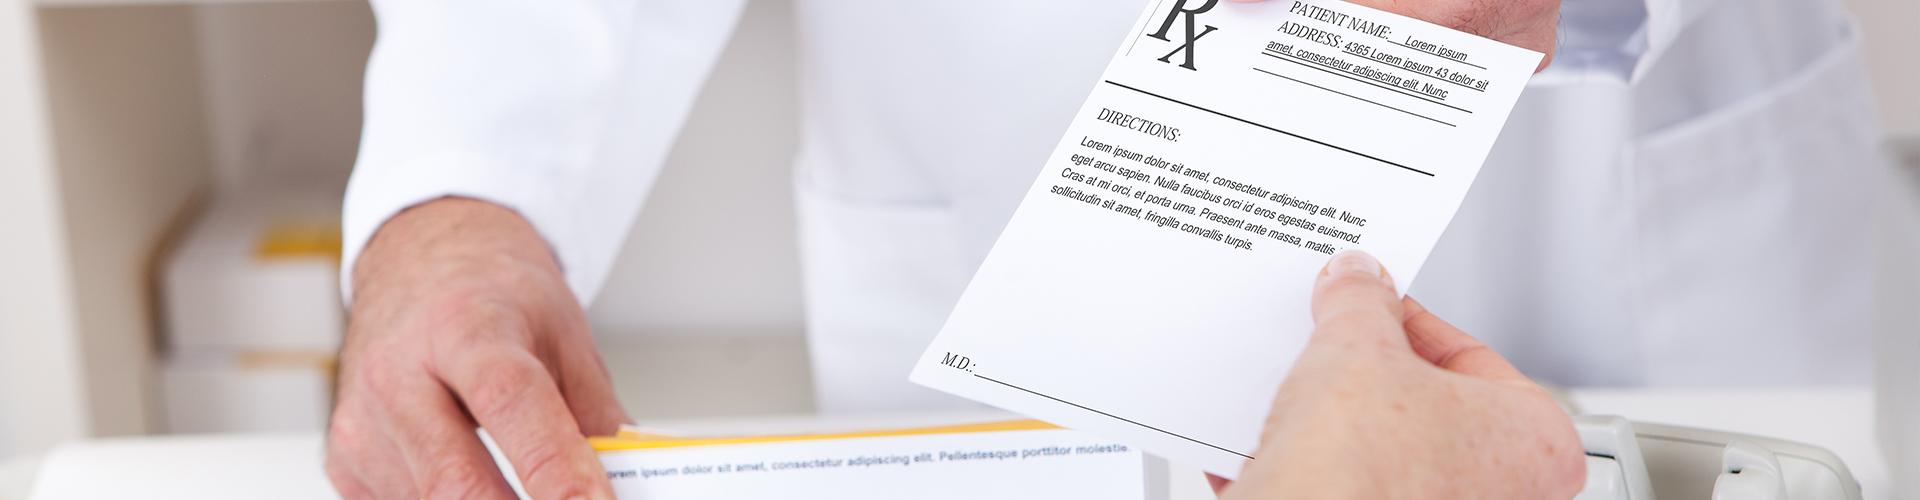 customer hands prescription to pharmacist